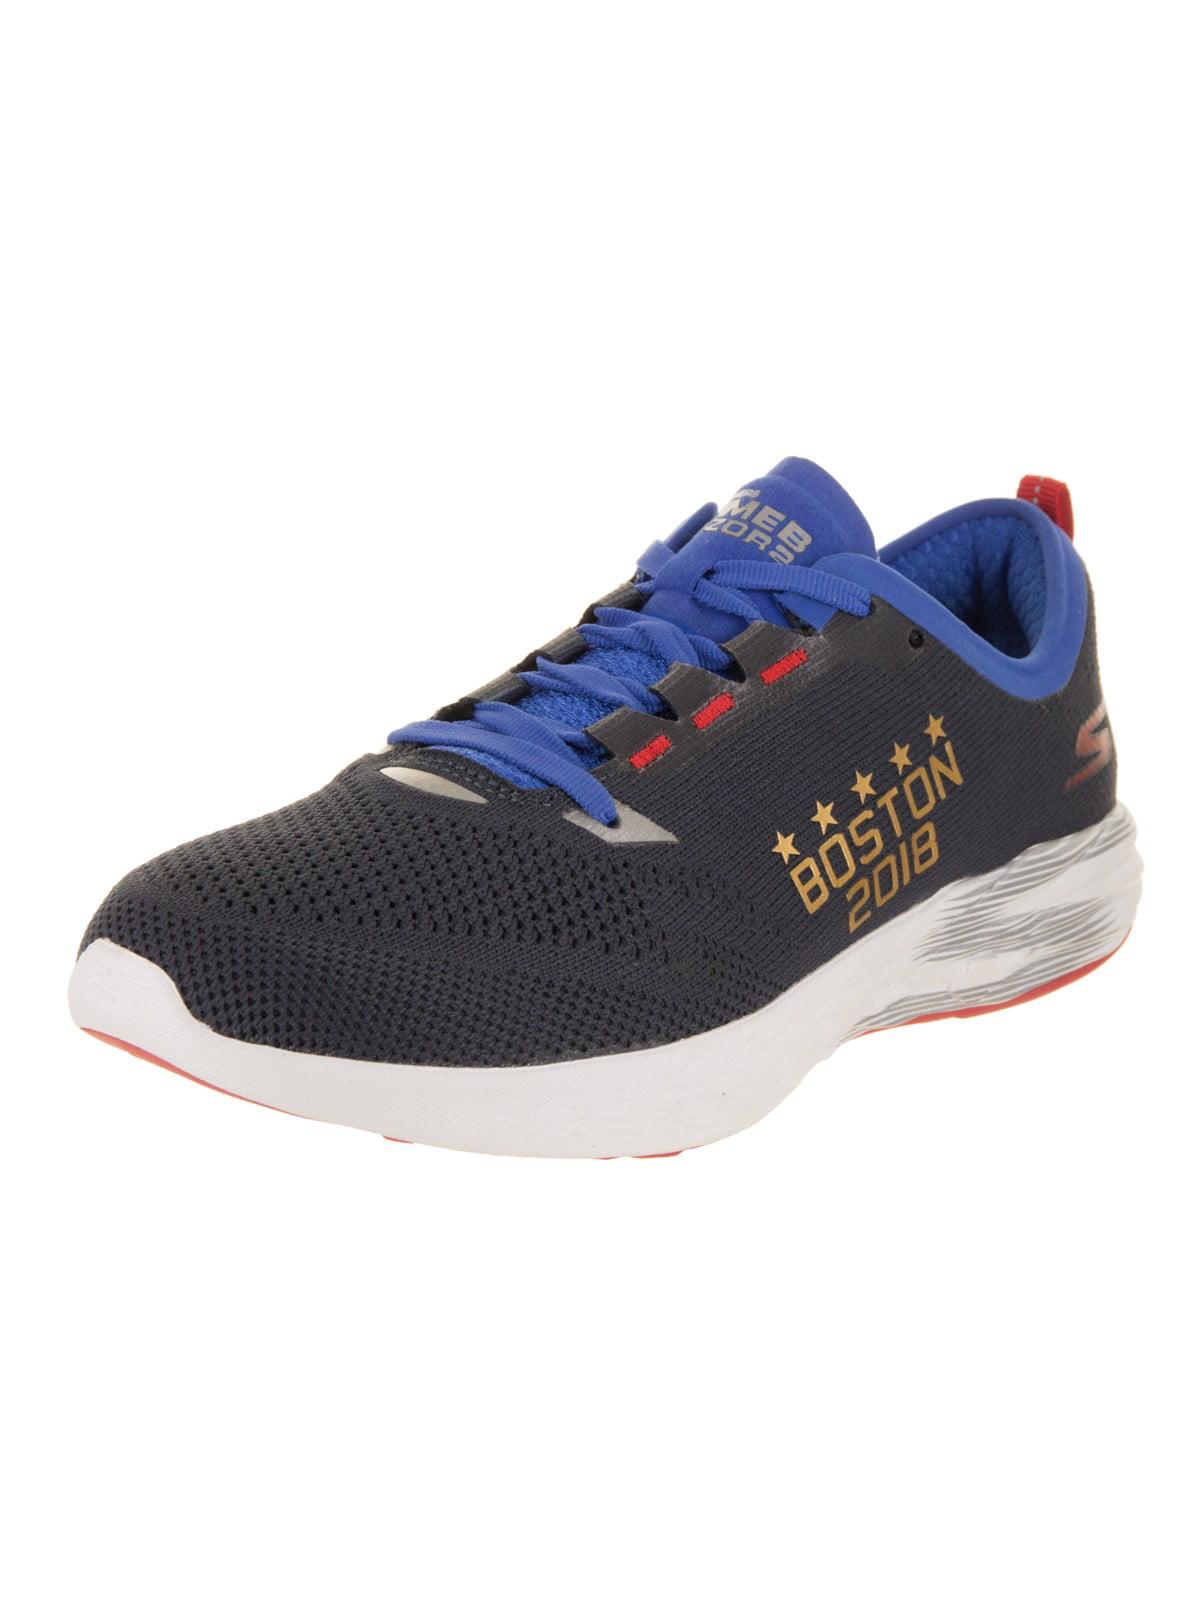 Skechers Women's GO Meb Razor 2 - Boston Marathon 2018 Training Shoe